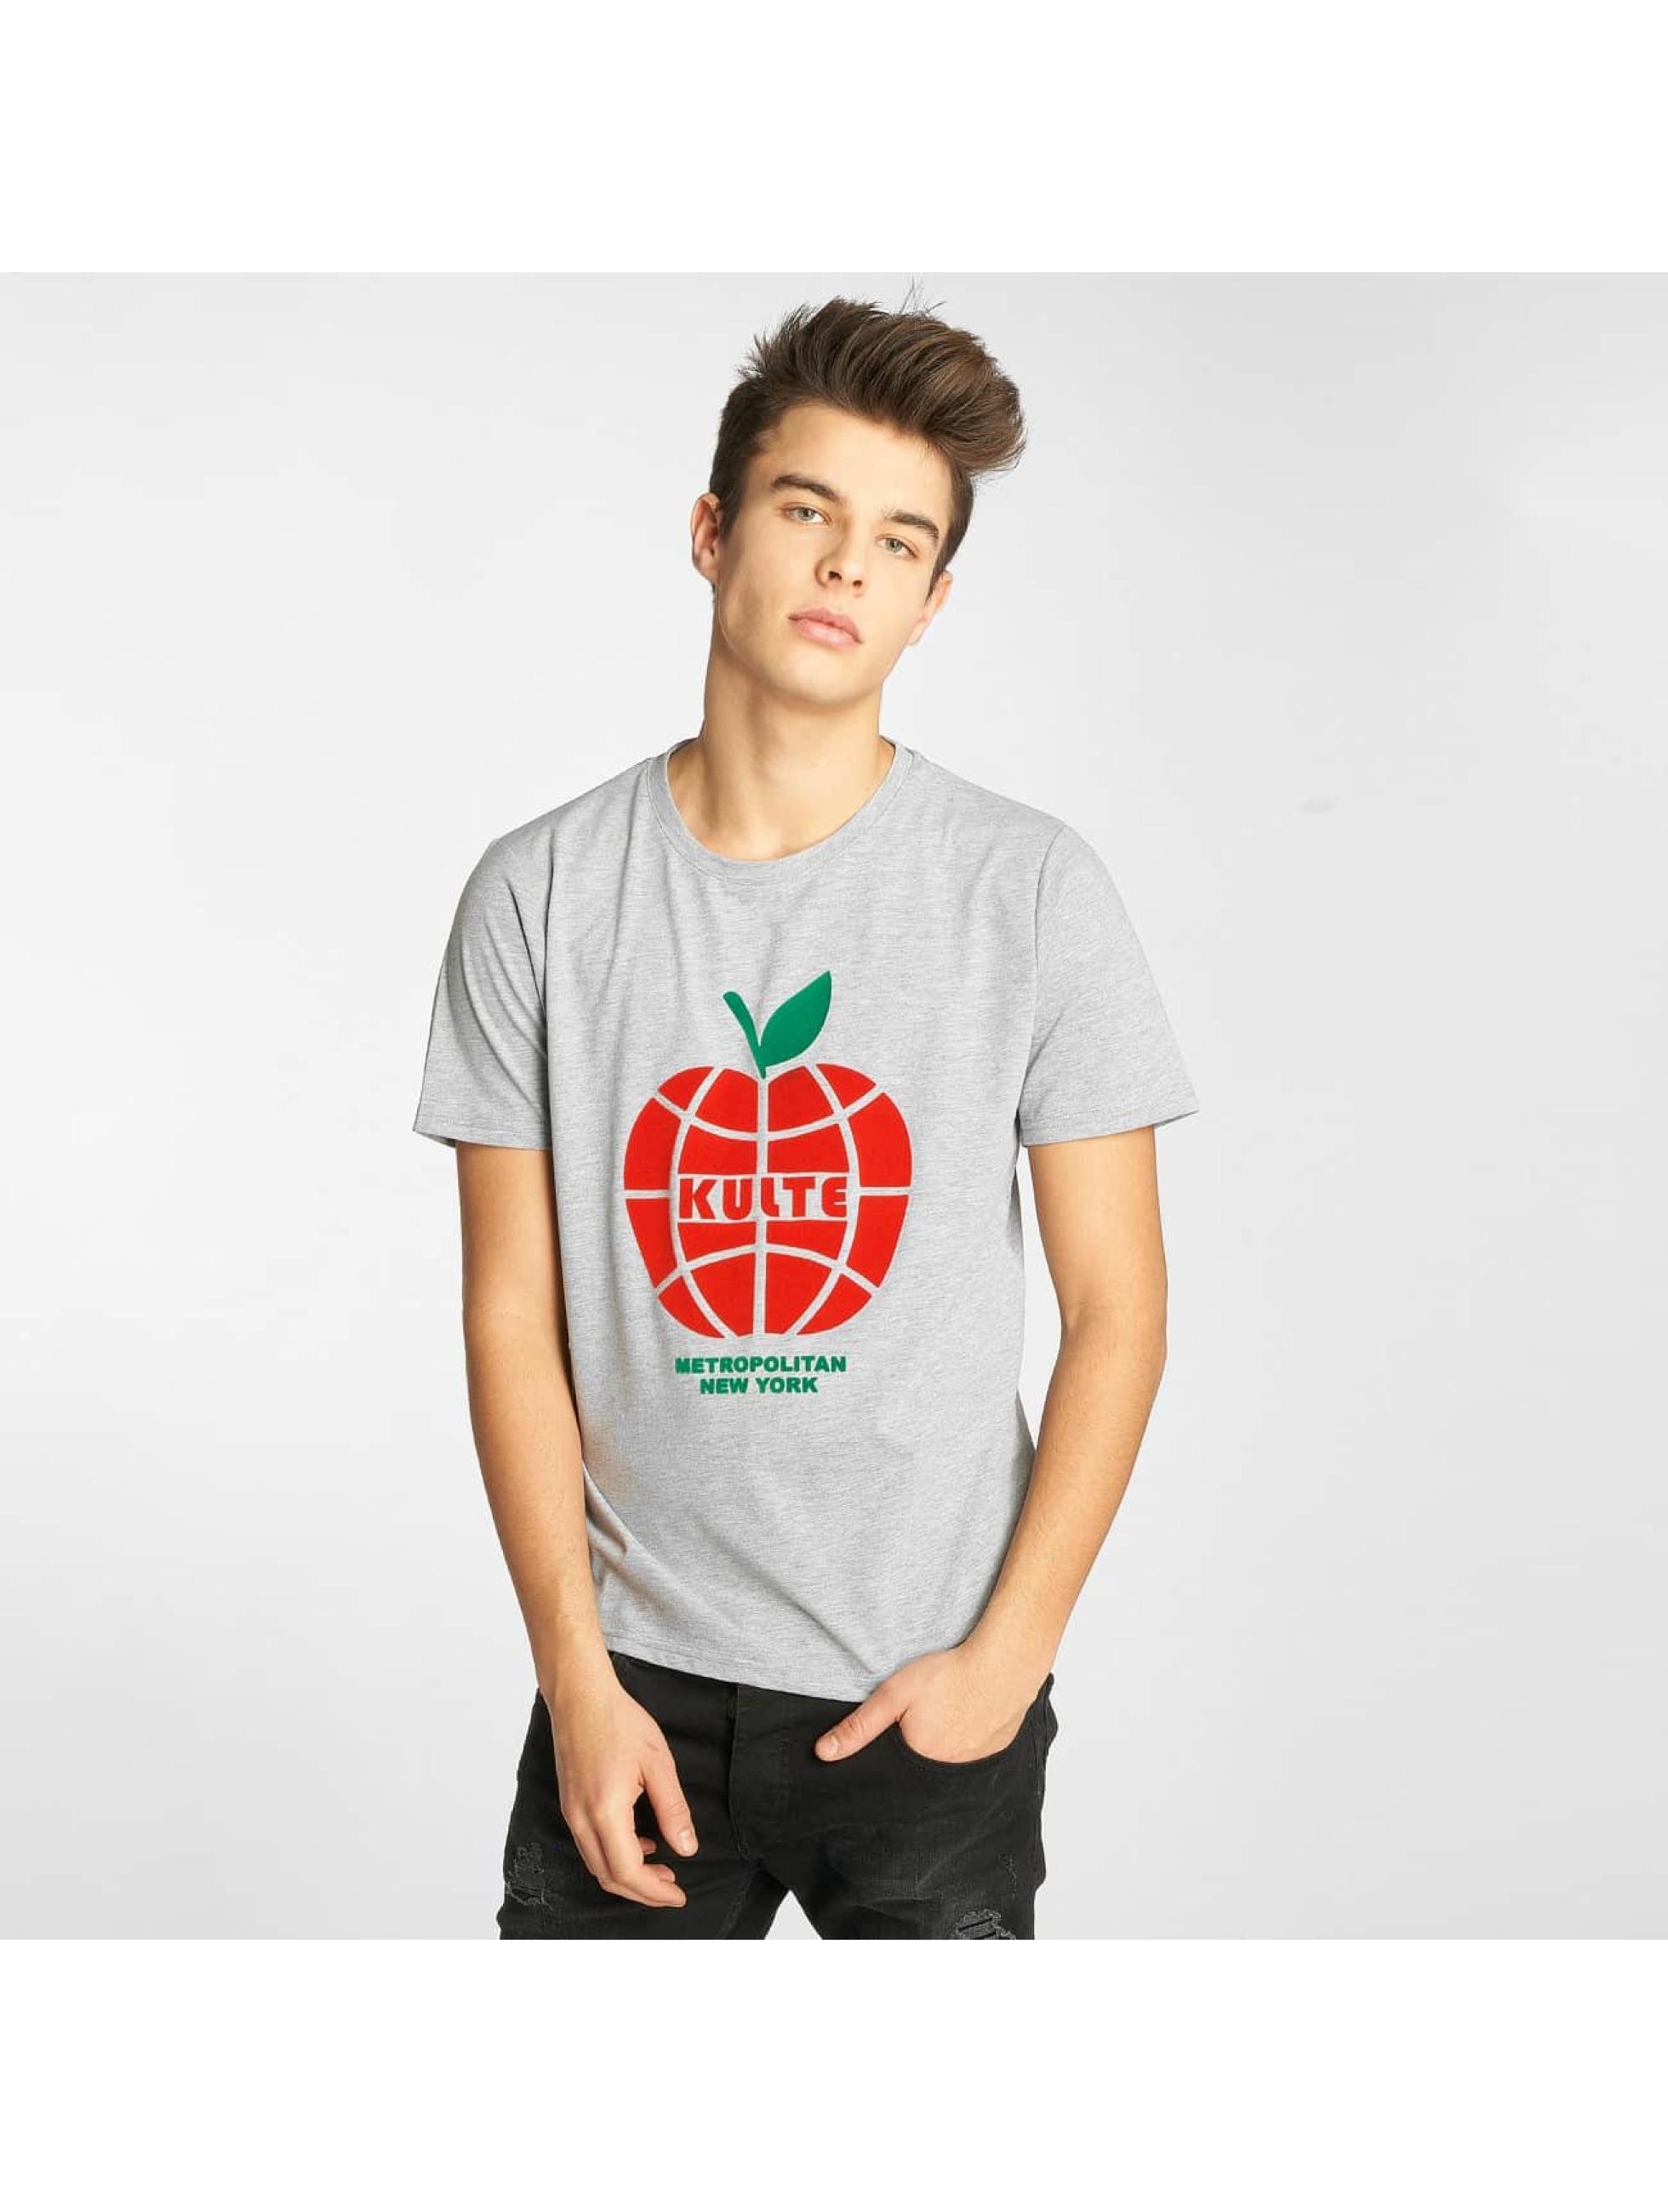 Kulte T-Shirt New York grey